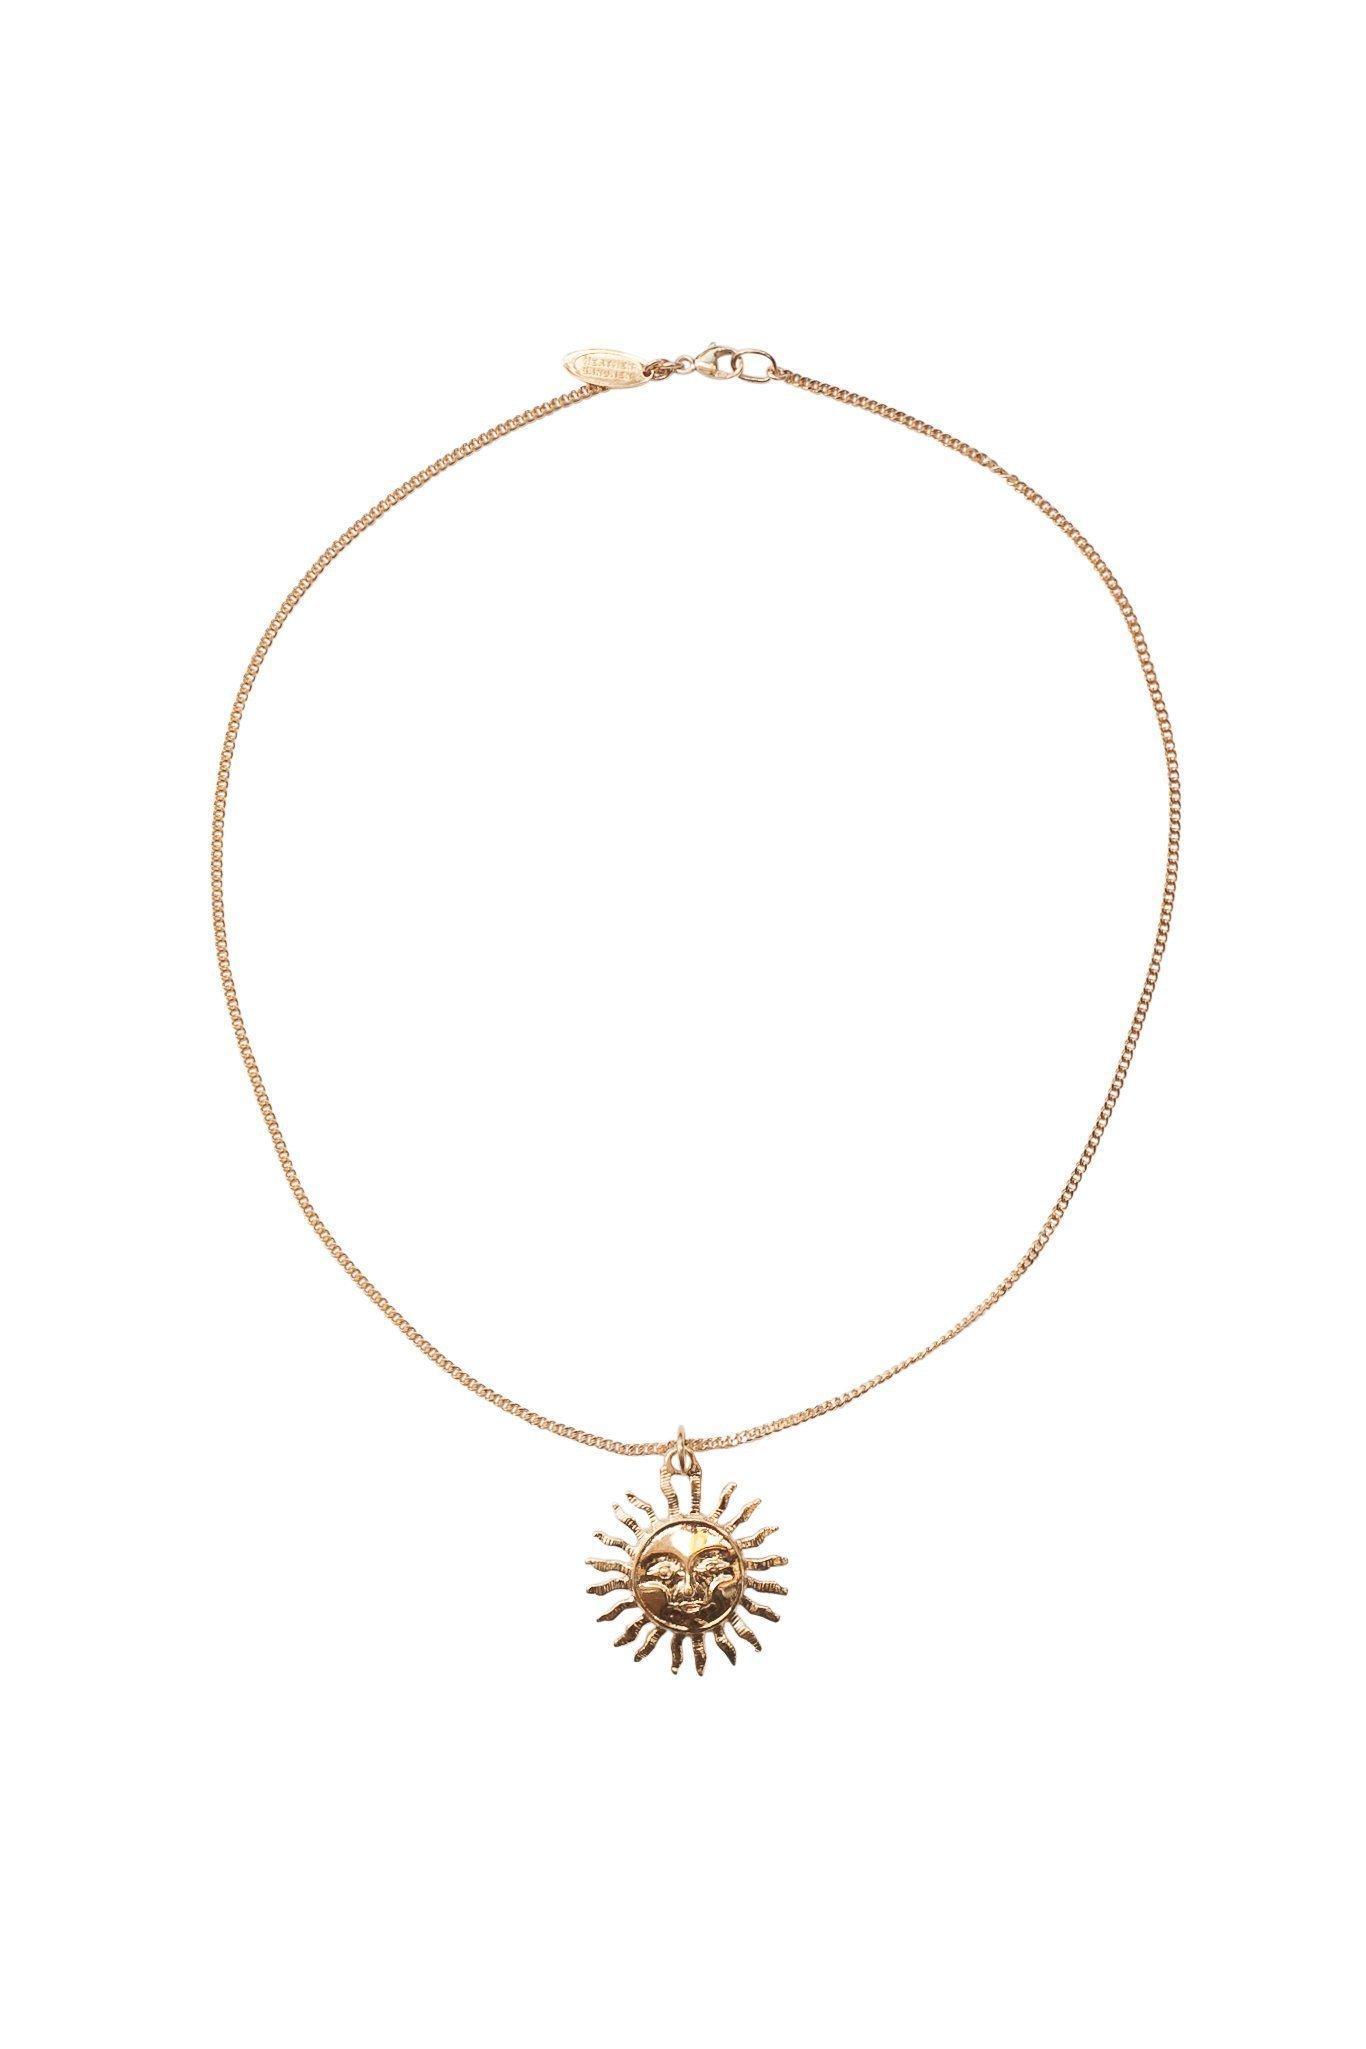 Heather Gardner - Vintage Sun Necklace in Gold, Rose Gold, or Silver